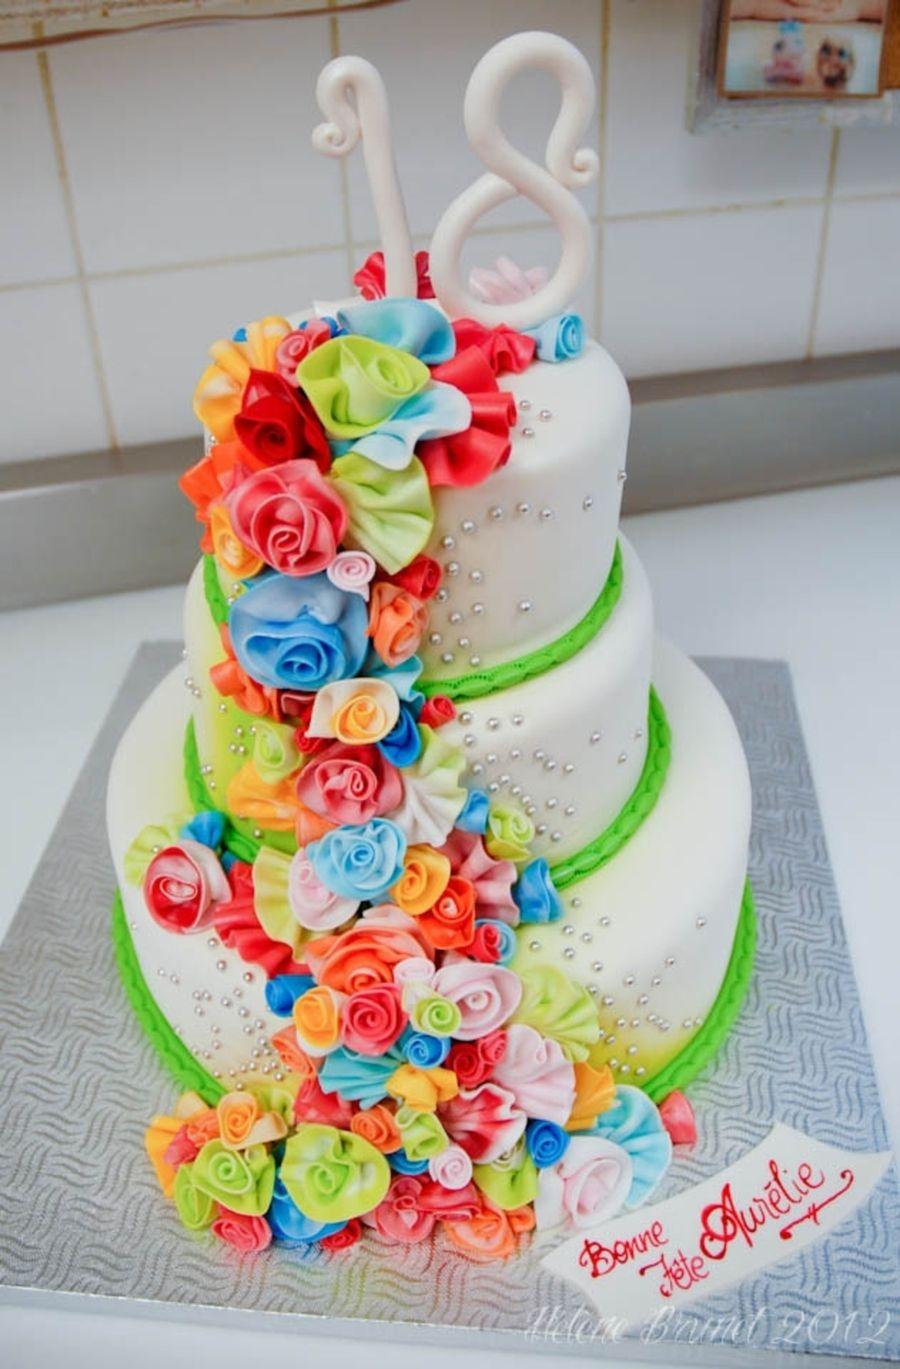 18th birthday cake decorations